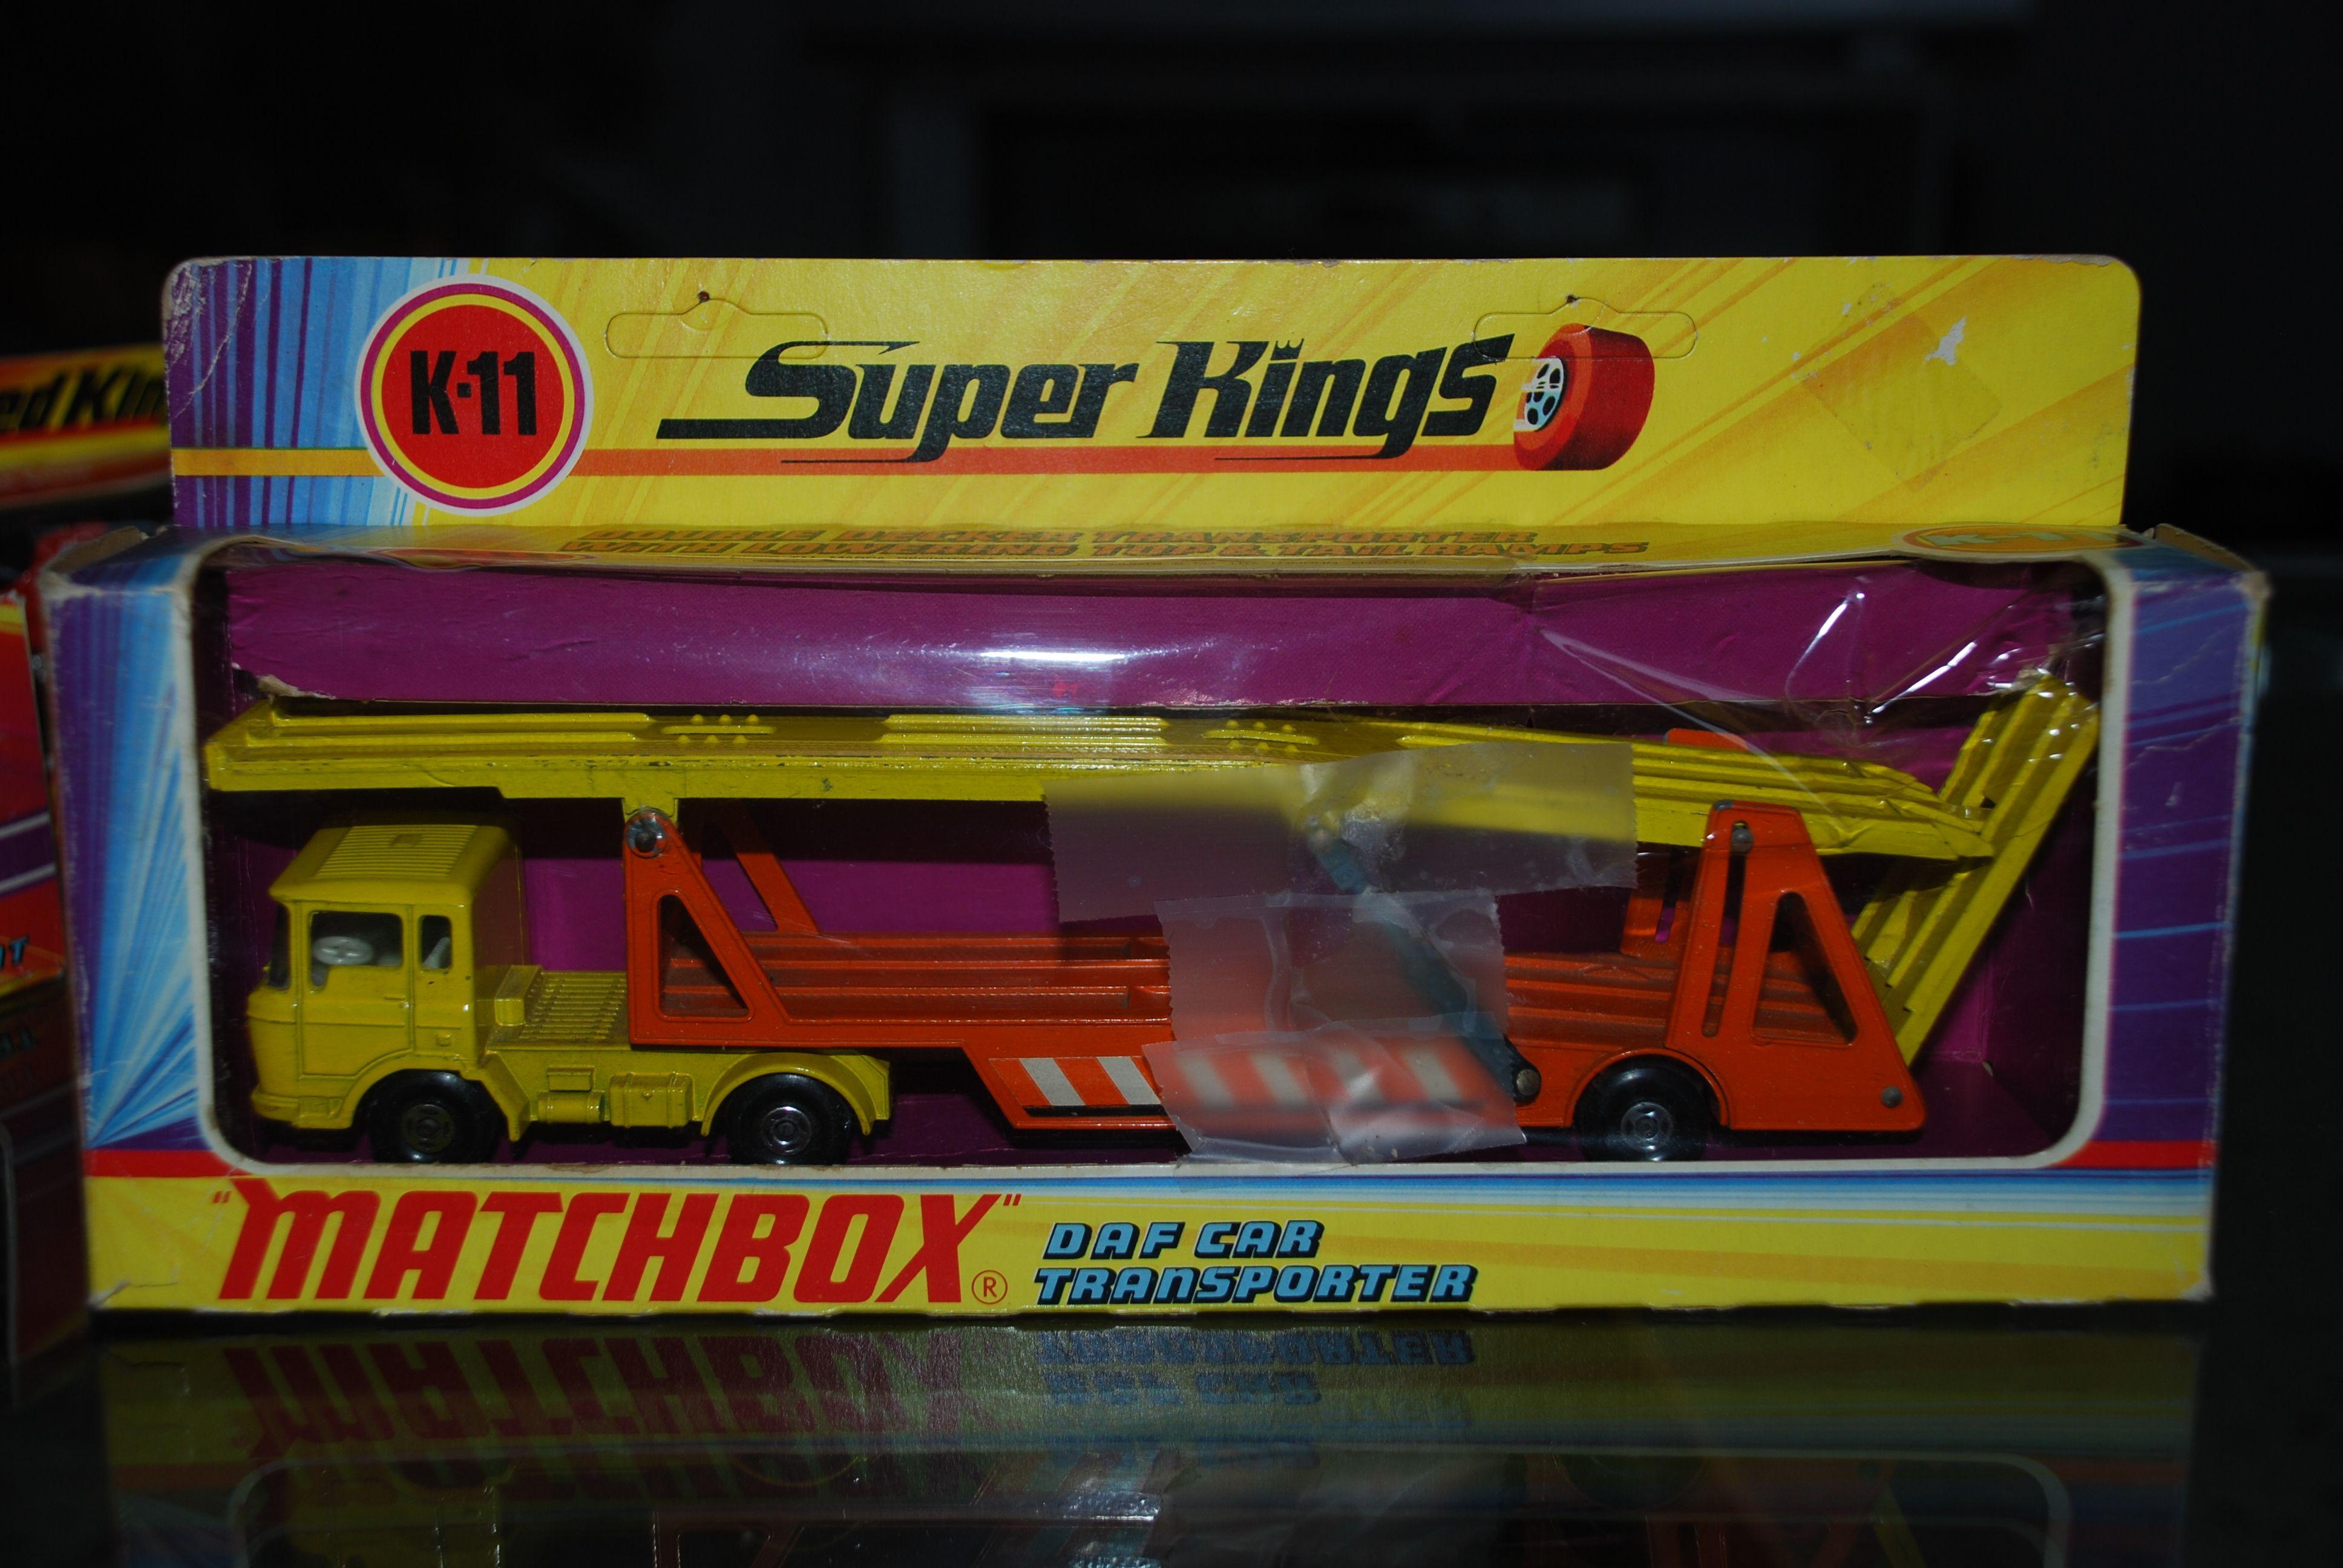 Superkings Matchbox Matchbox Cars Classic Toys